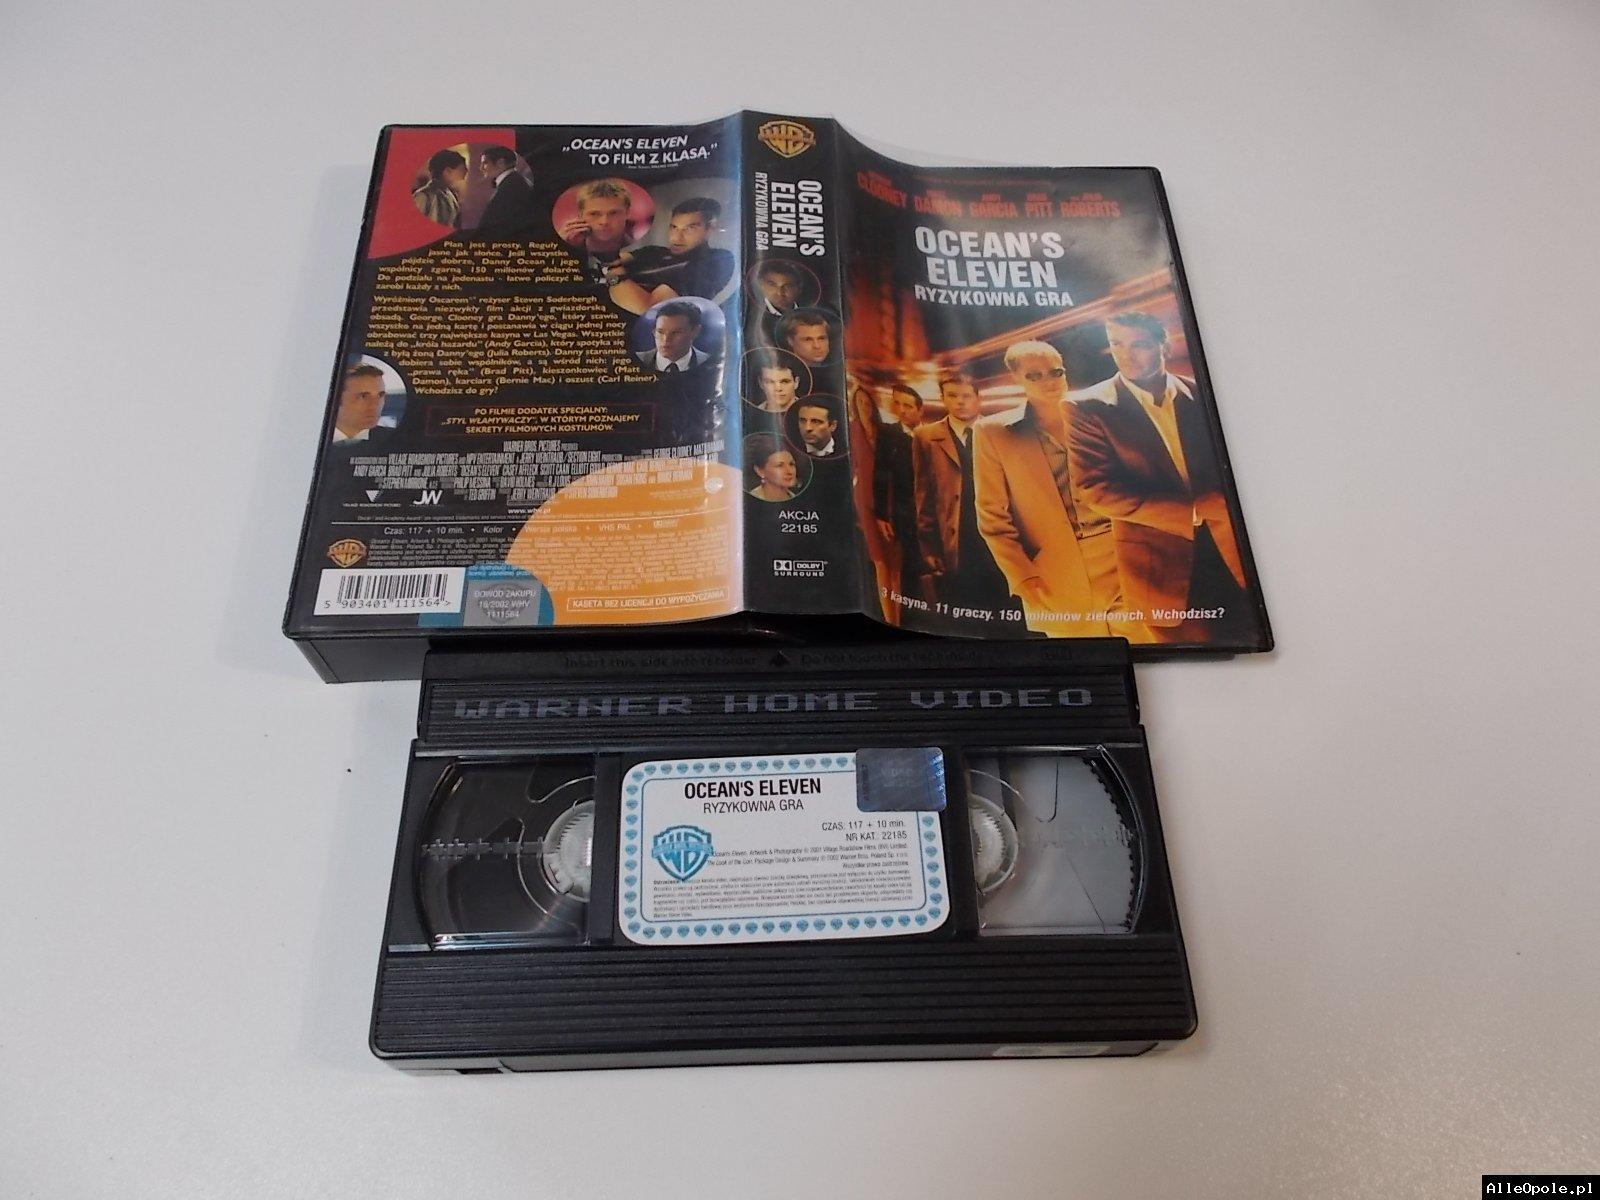 RYZYKOWNA GRA - VHS Kaseta Video - Opole 1715